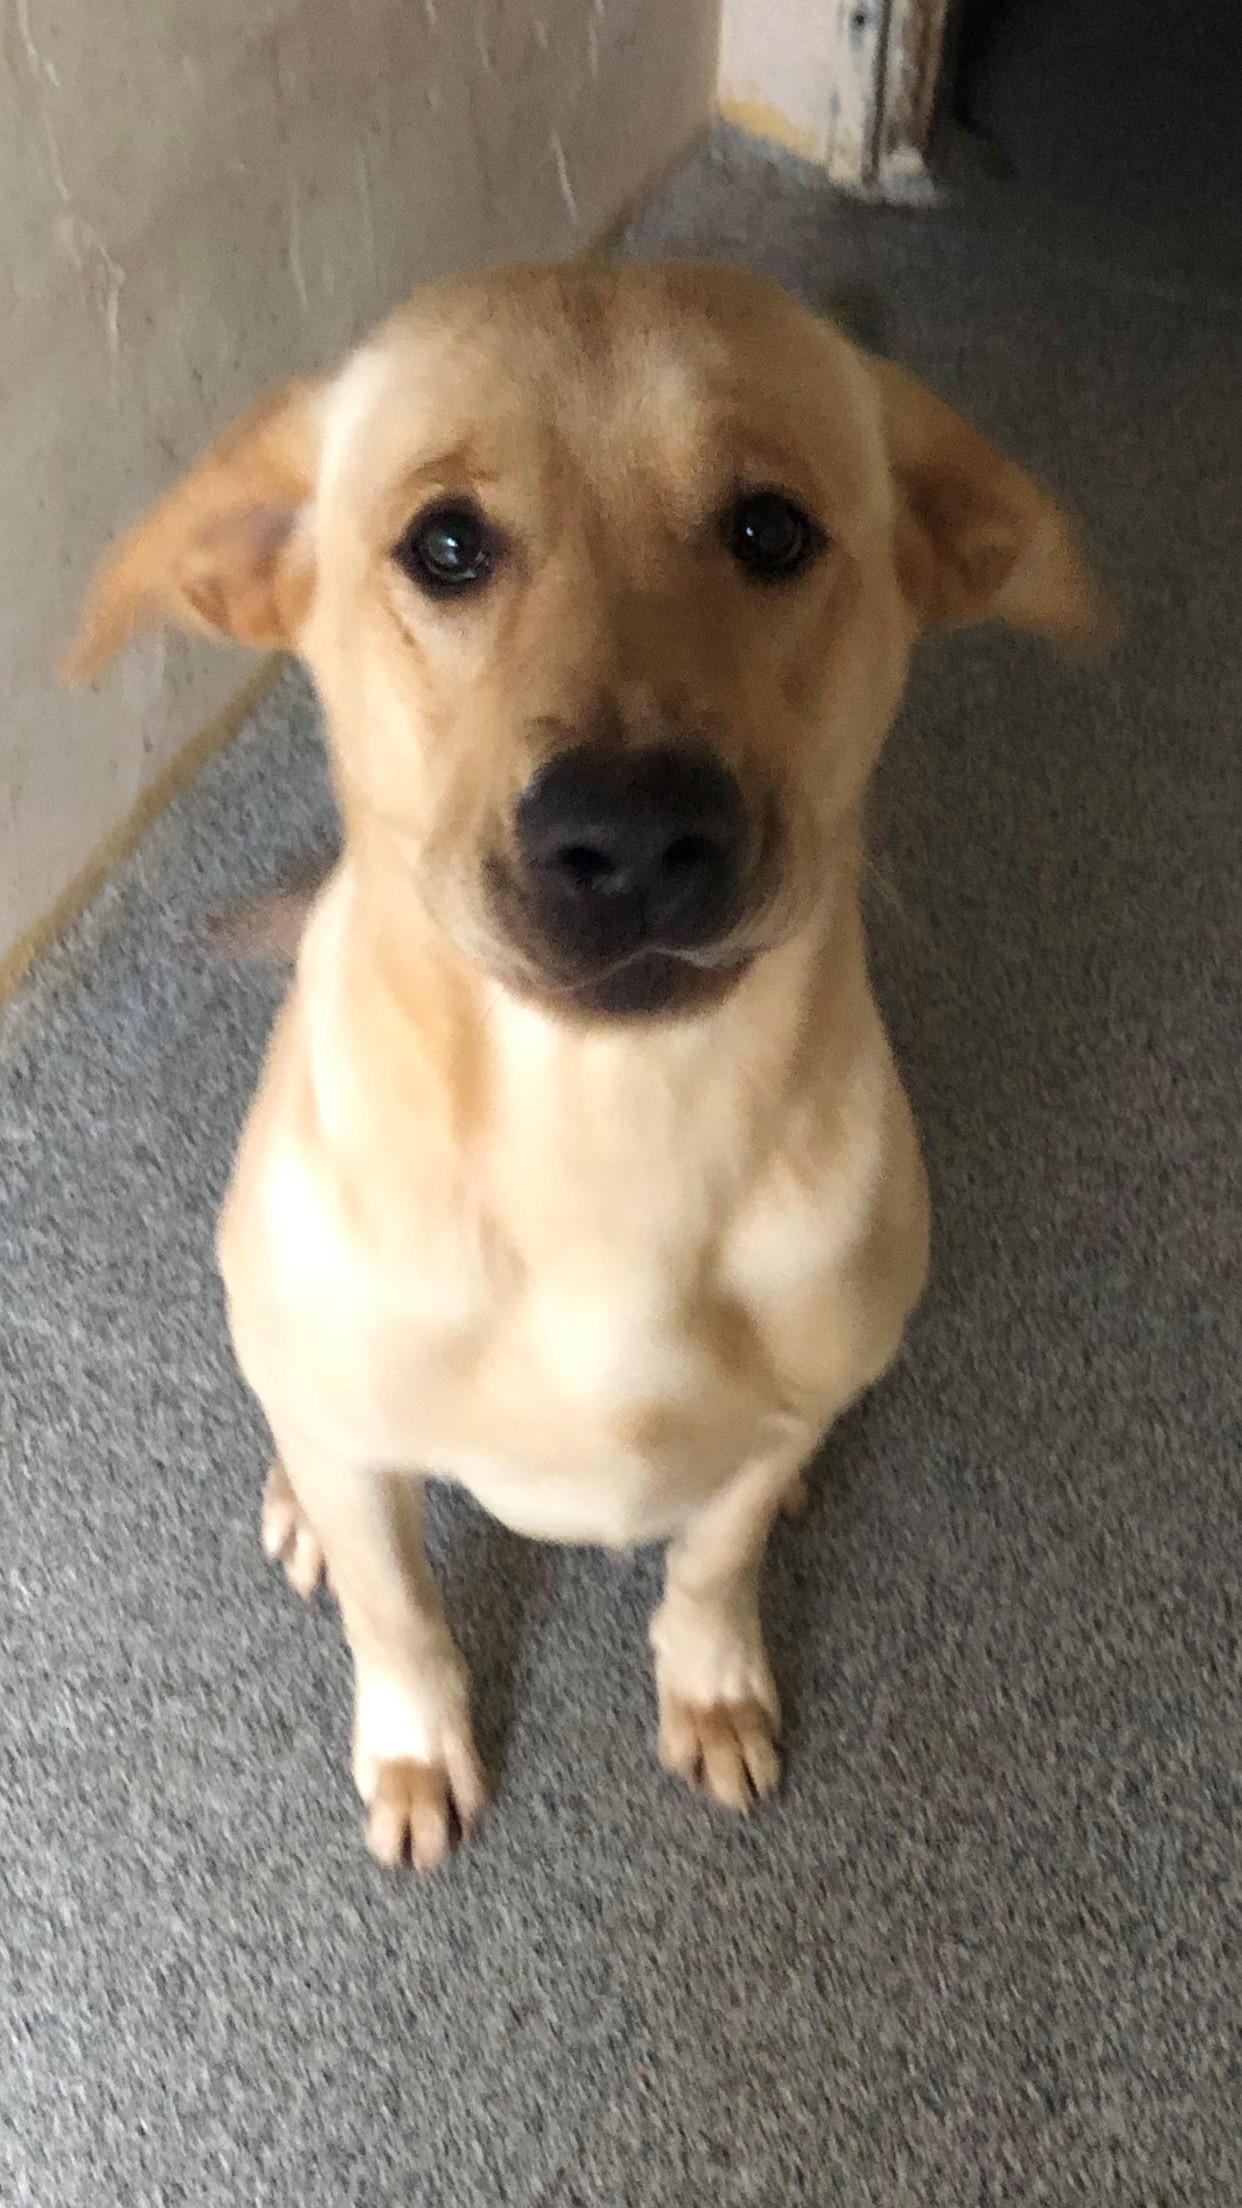 Rehome A Labrador The Labrador Lifeline Trust